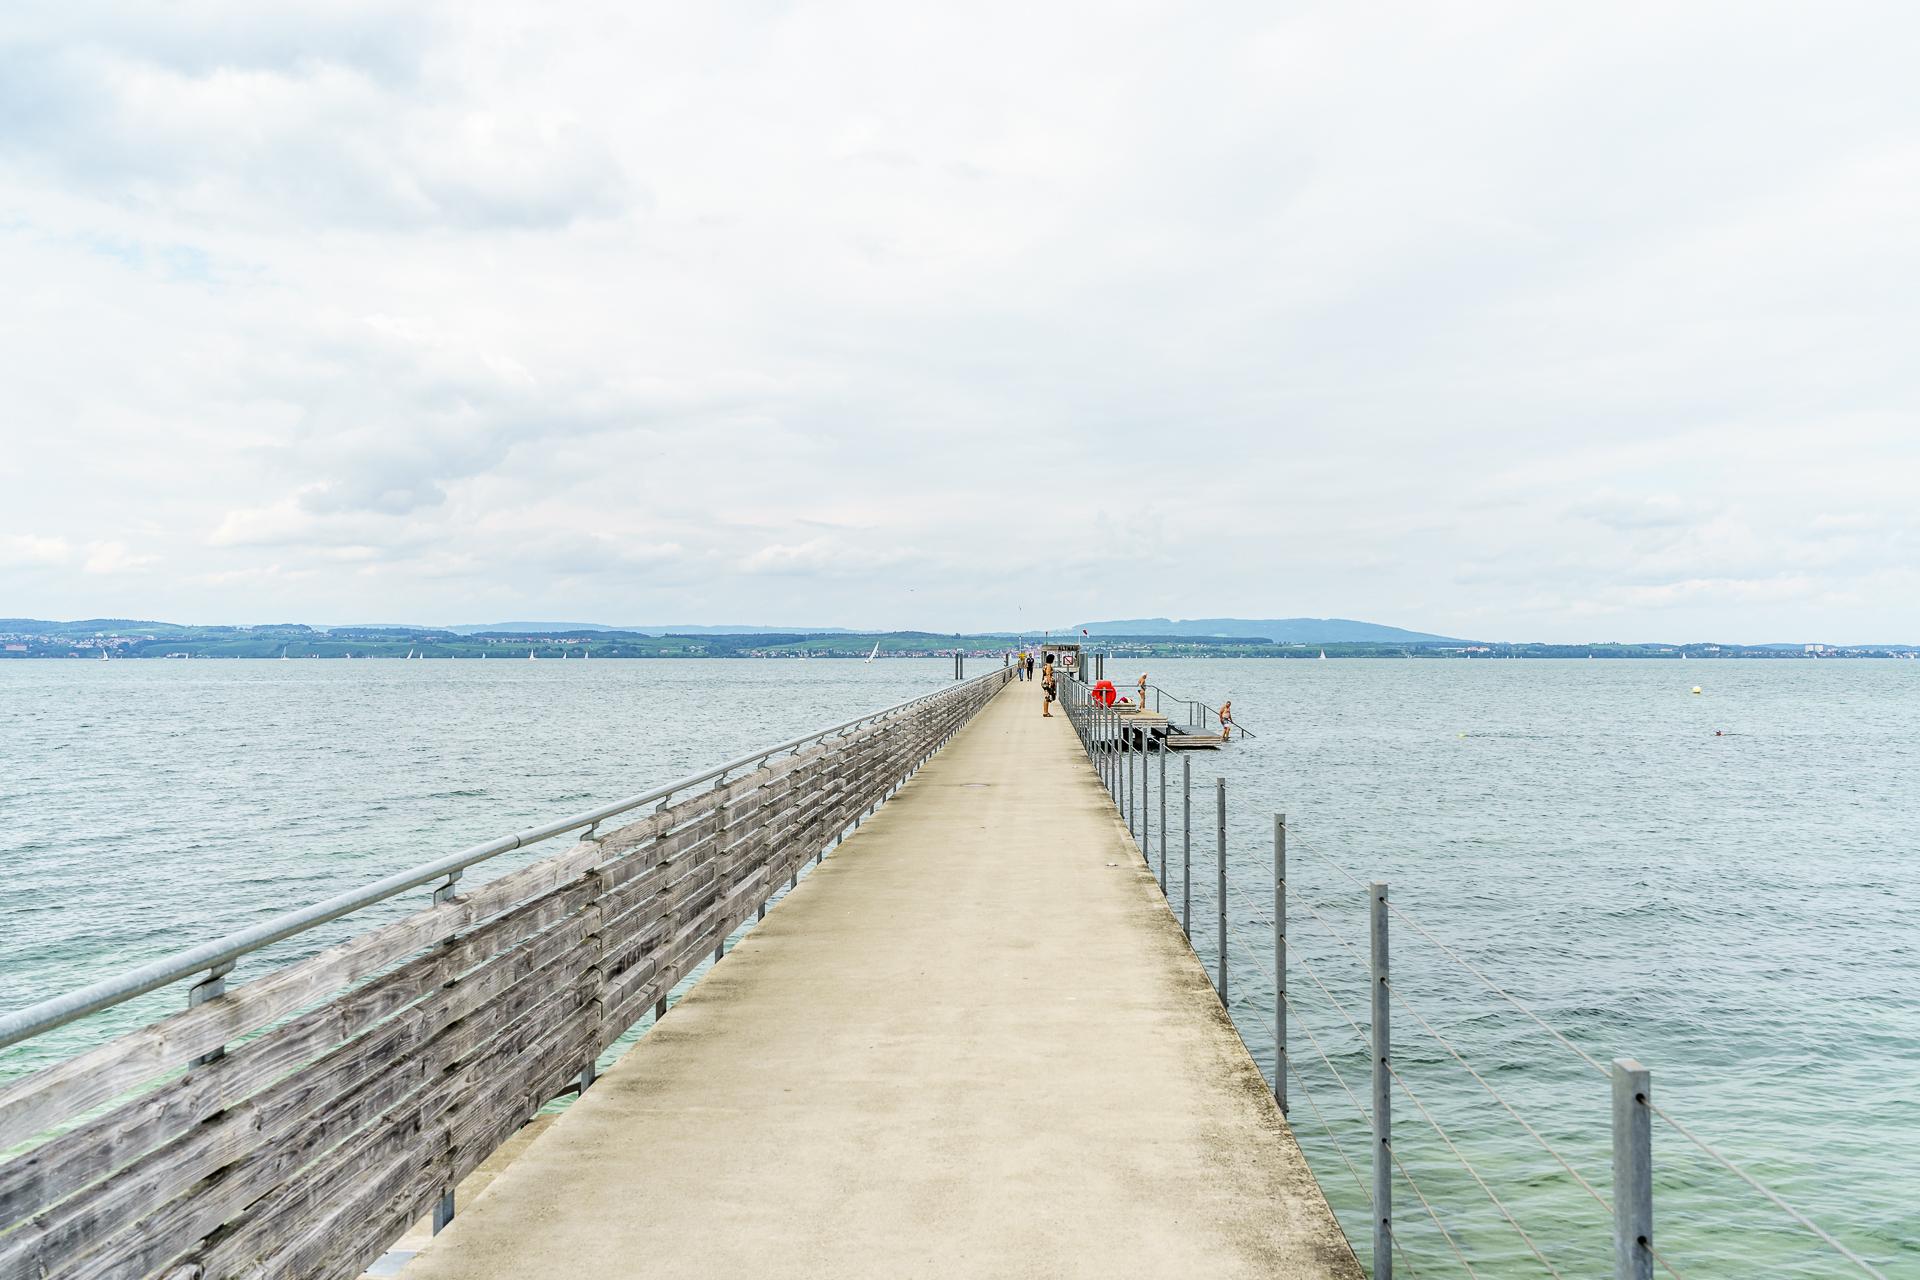 Altnau Ufersteg